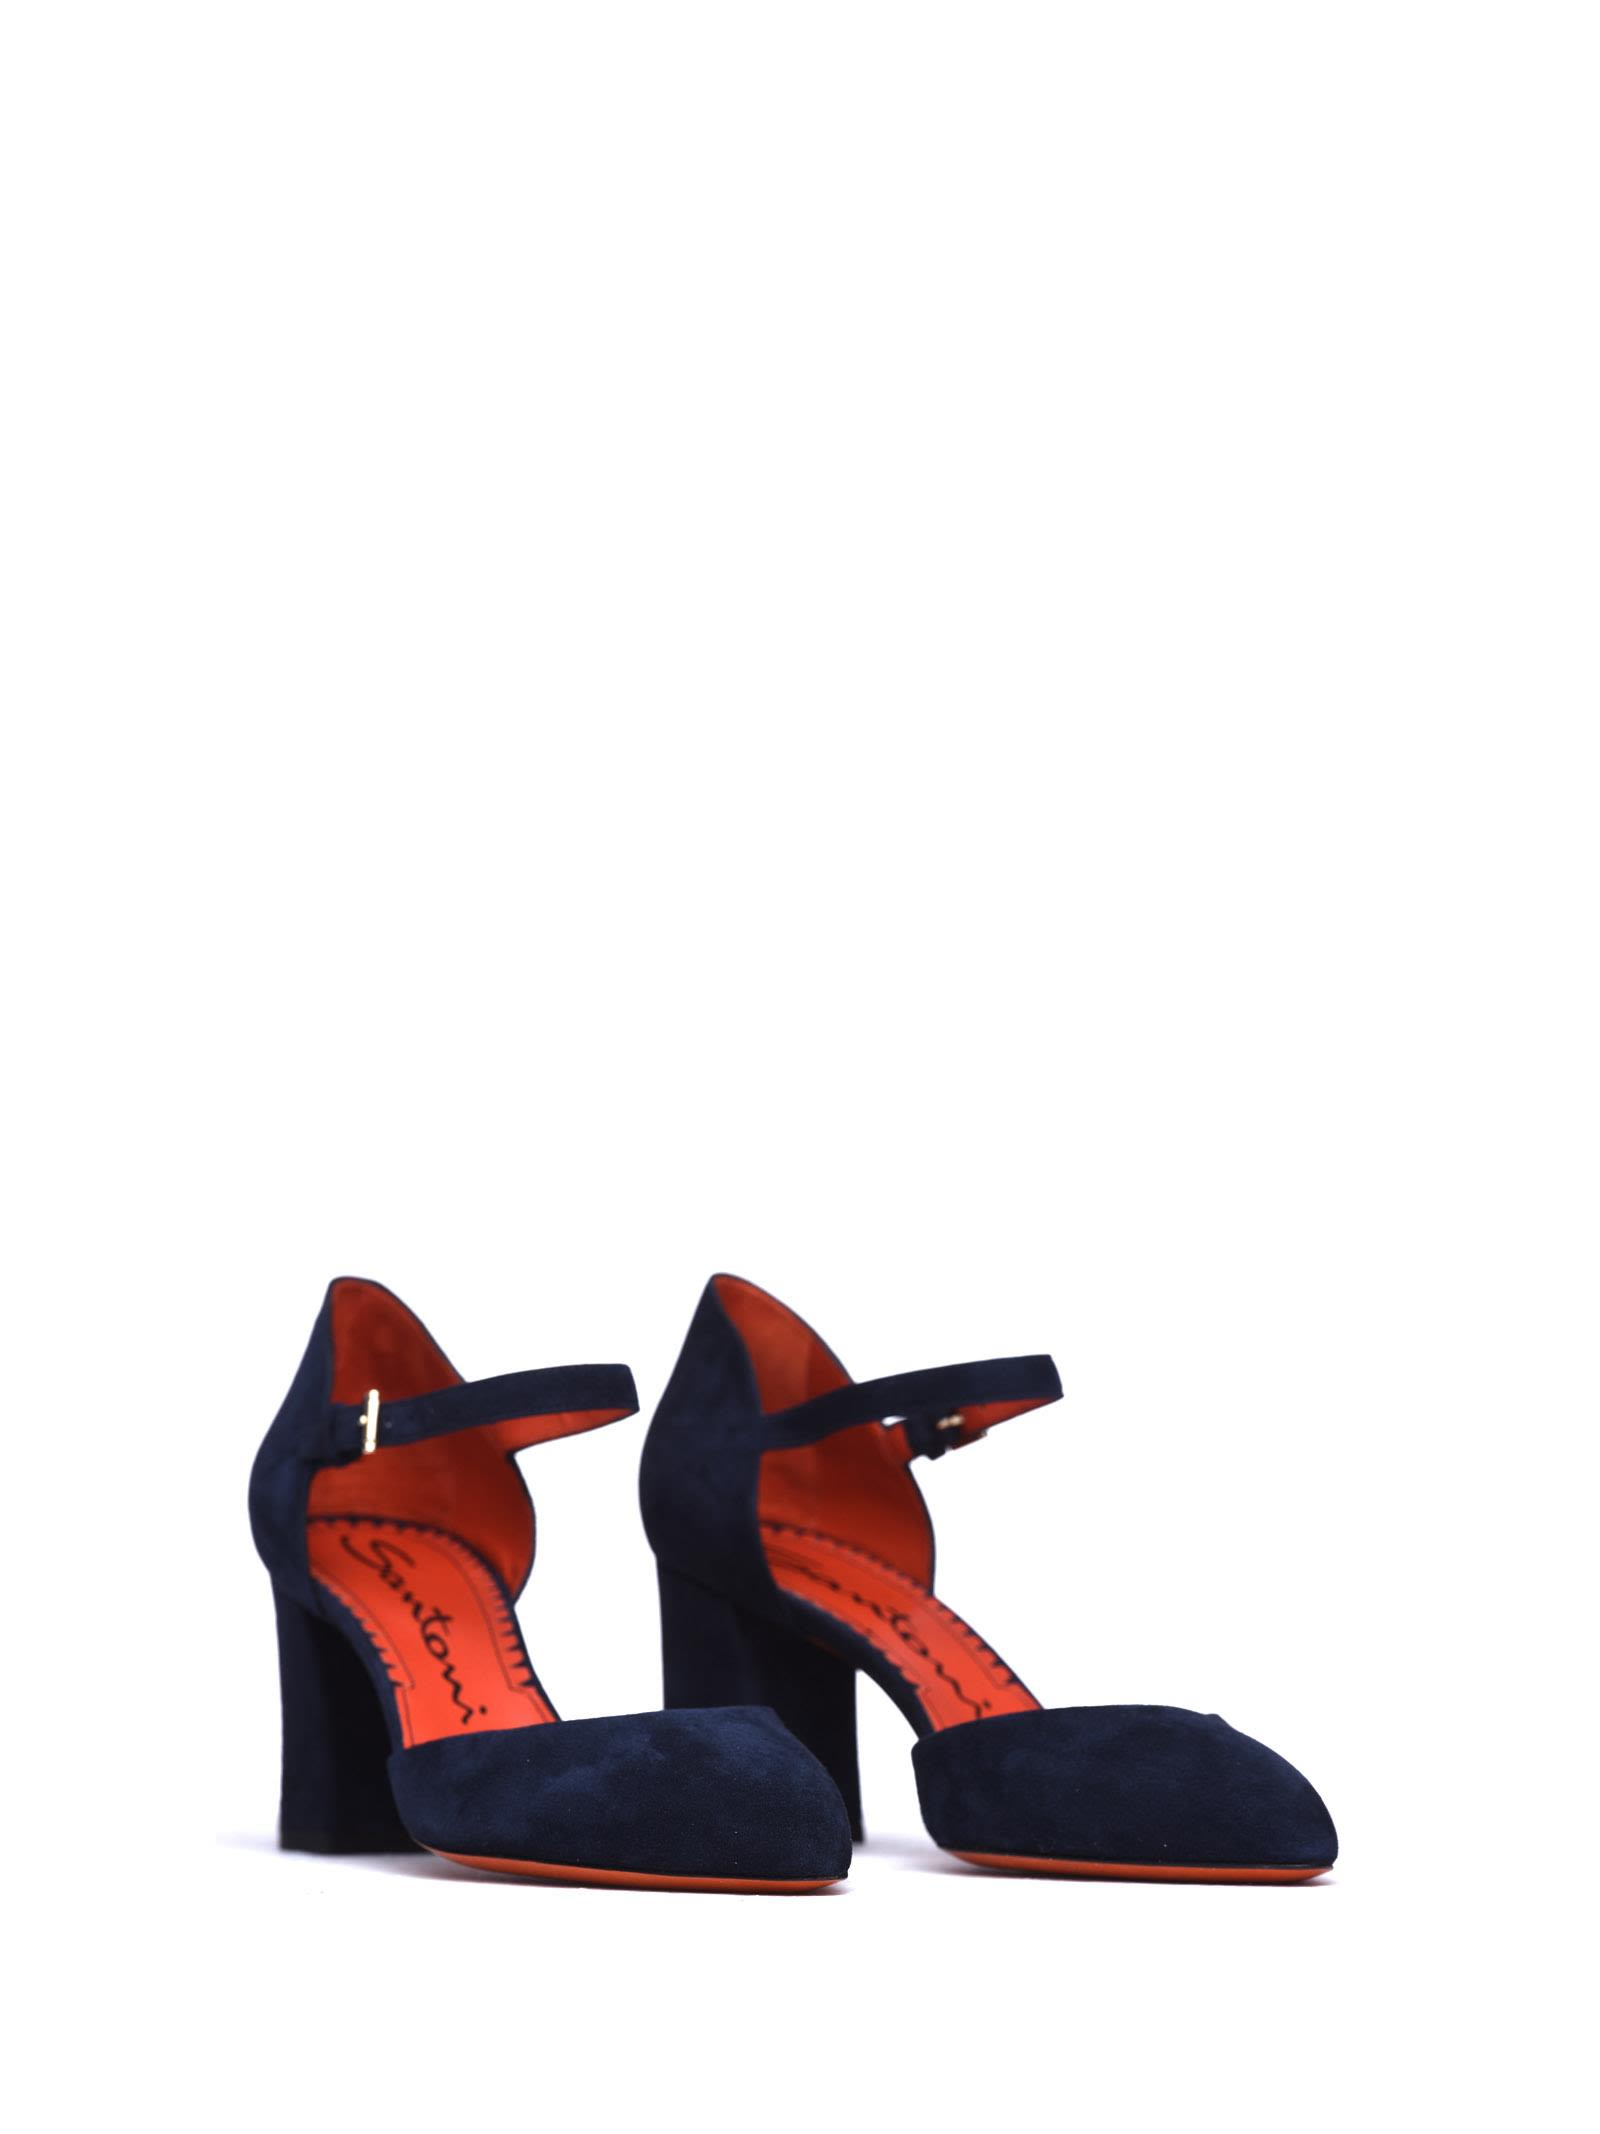 santoni Prima Linea Sandals In Blue Suede Affordable Is5N3Blfyf